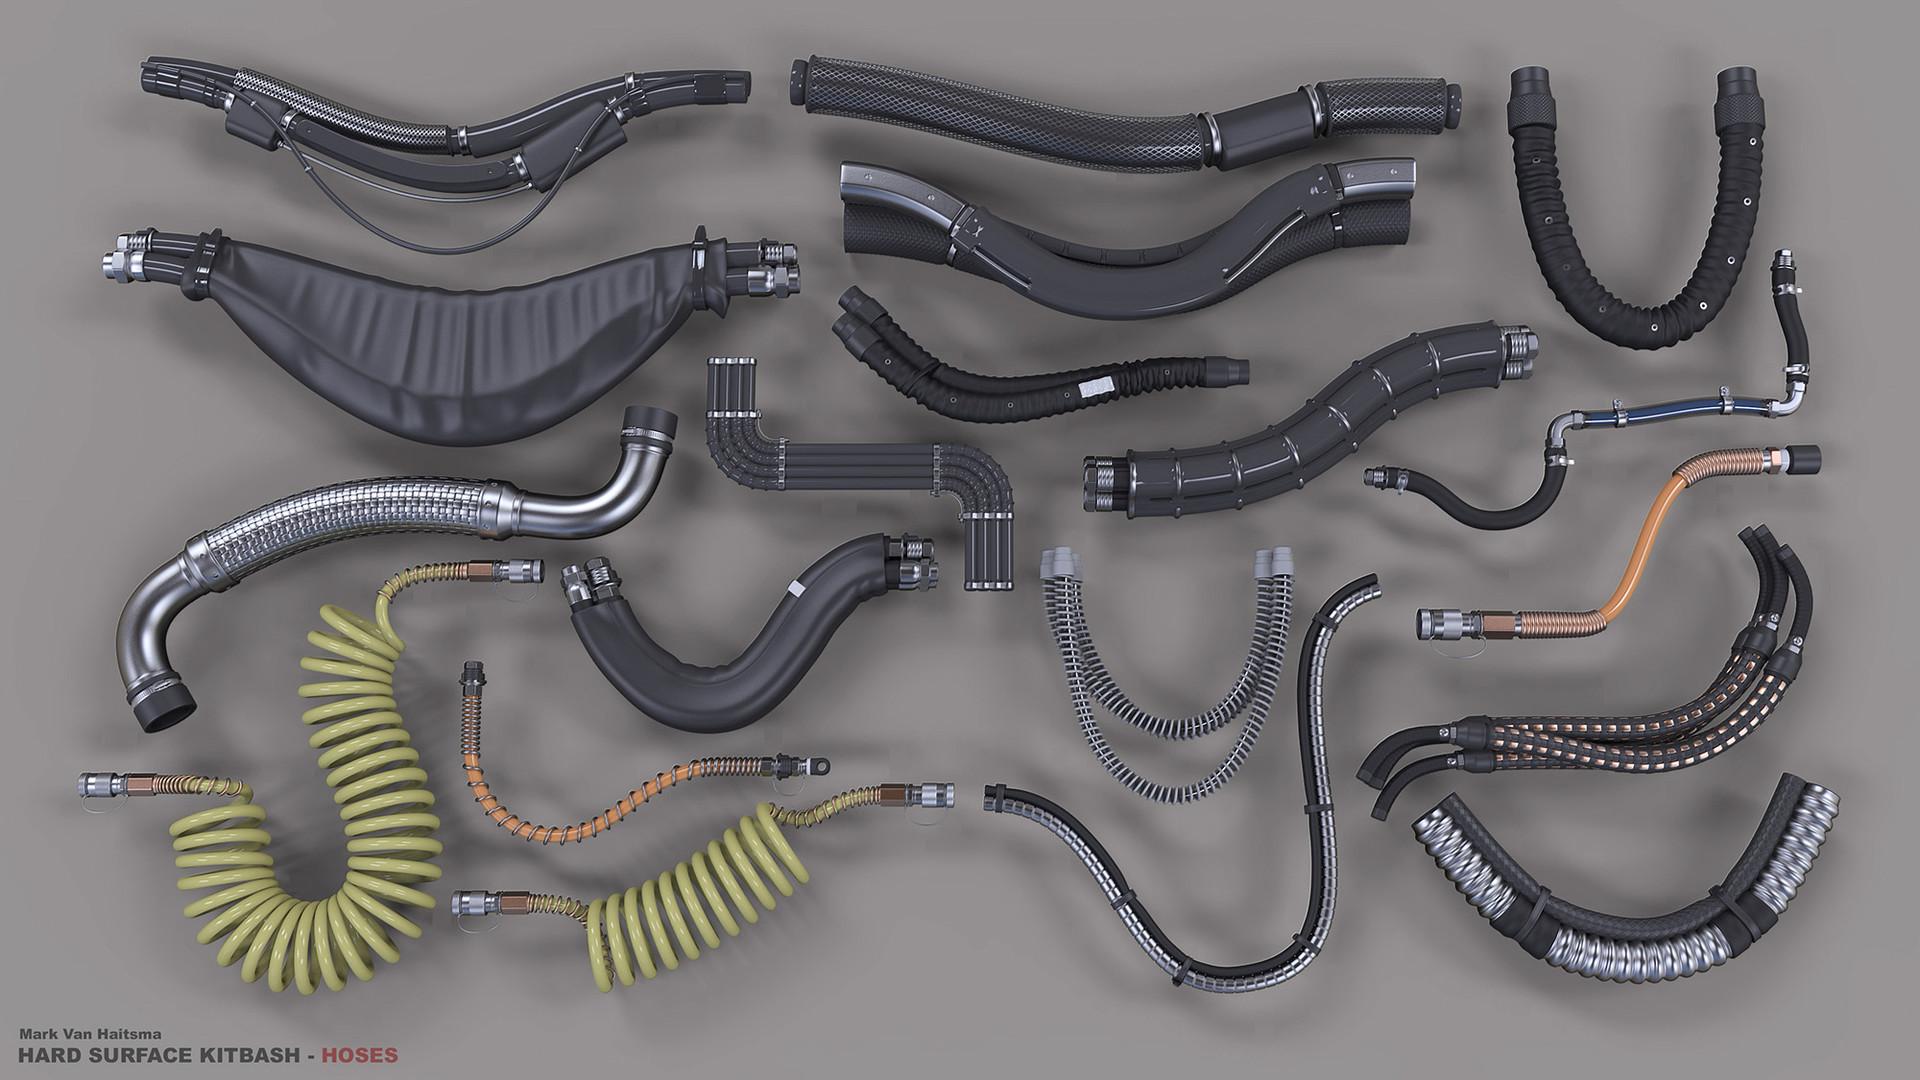 Mark van haitsma hoses collage 01 sm